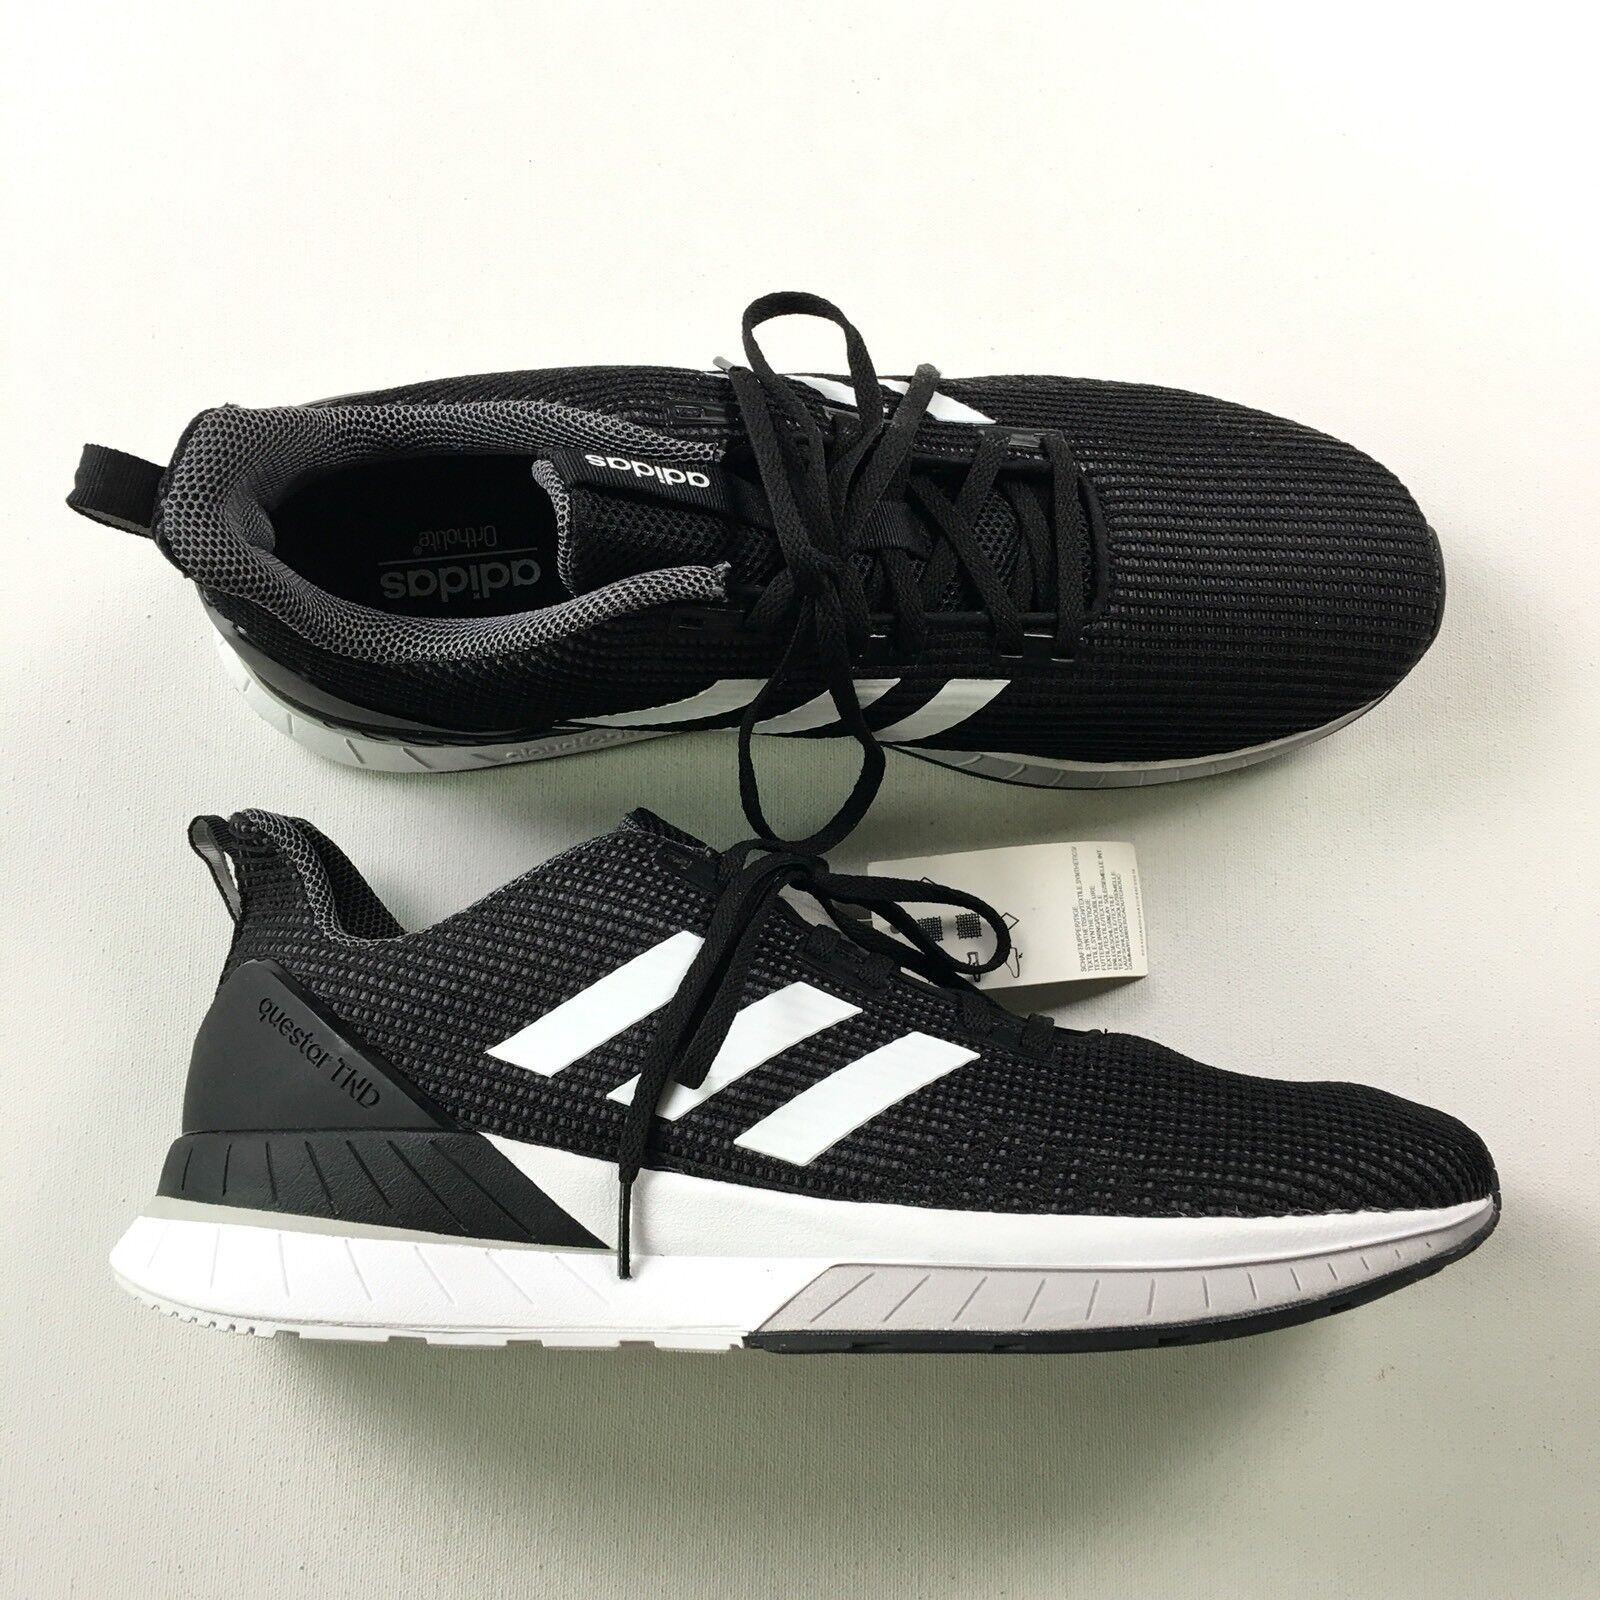 Adidas Herren 13 Questar Tnd Schwarze Lauftrainer 13 Herren Kunst DB1122 691c1d